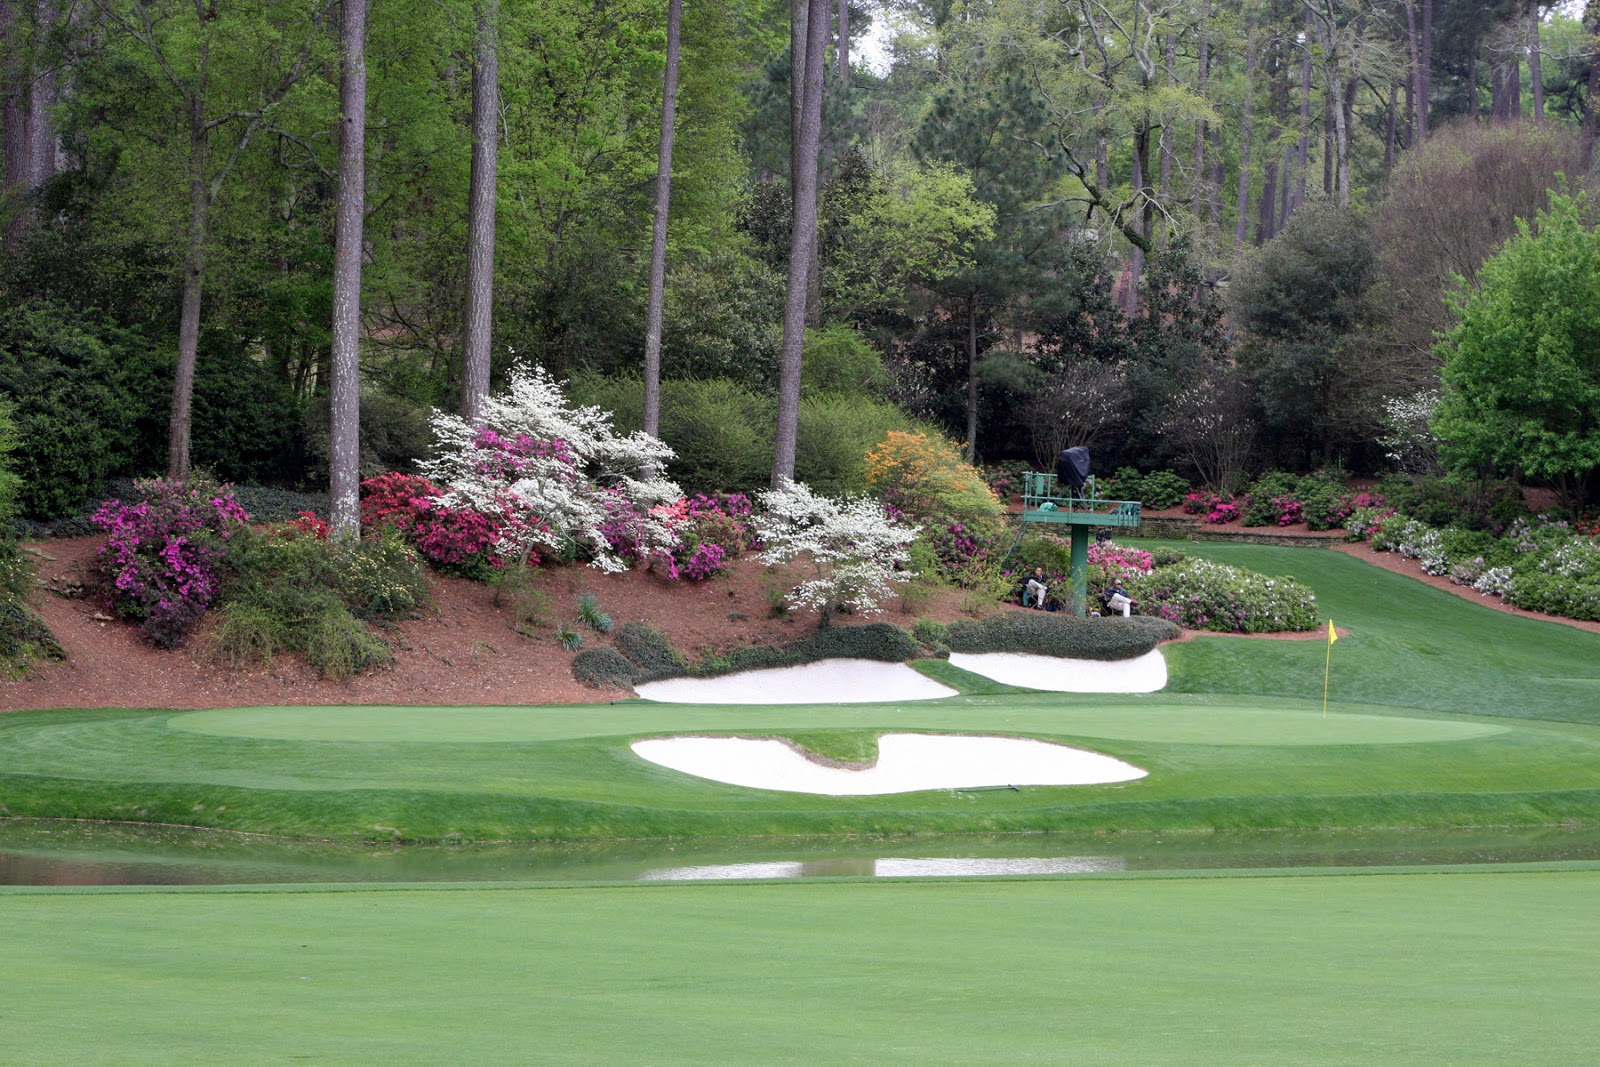 http://2.bp.blogspot.com/_Mpphm-adxxc/TUt4x5K-SoI/AAAAAAAAAhY/dYd7l7kgGNo/s1600/12th+at+Augusta.jpg